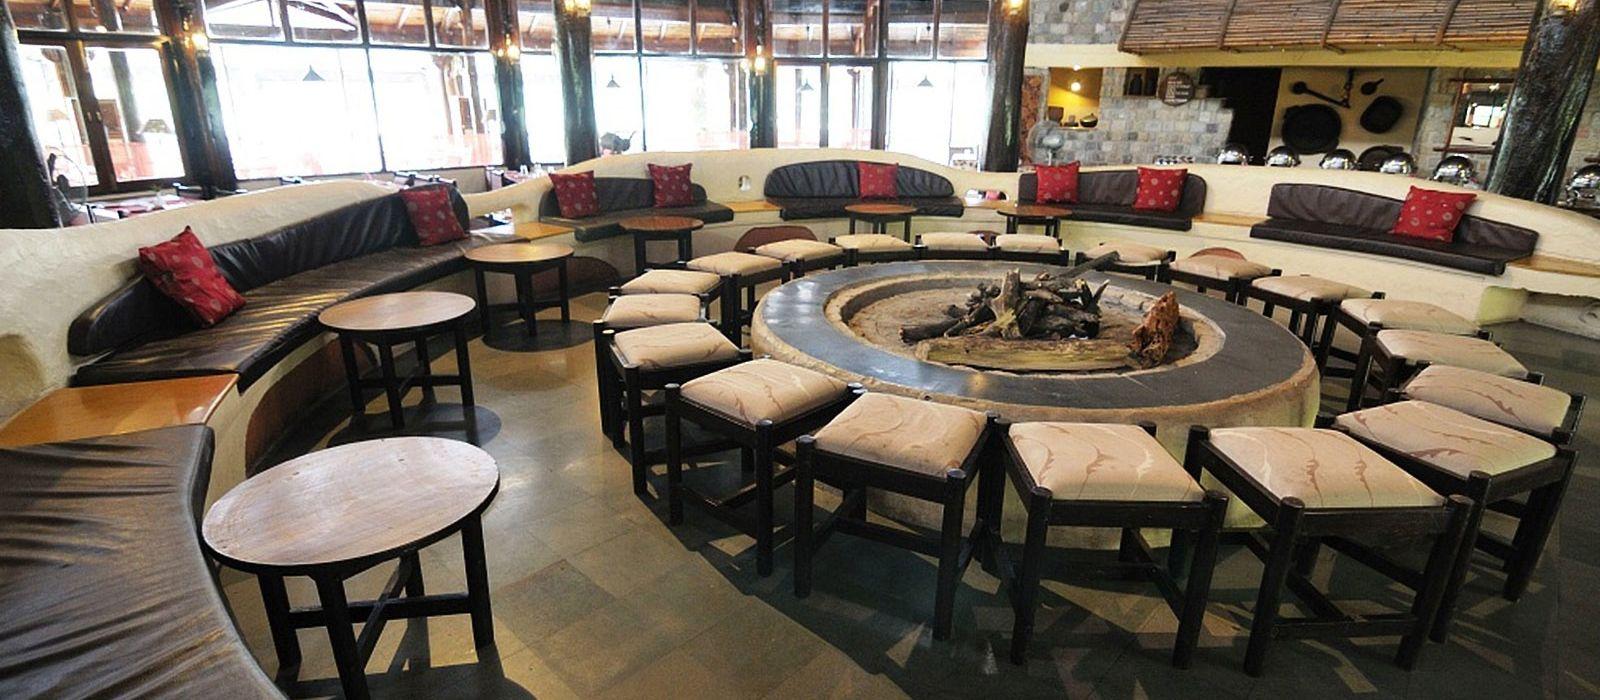 Hotel Infinity Resorts East India